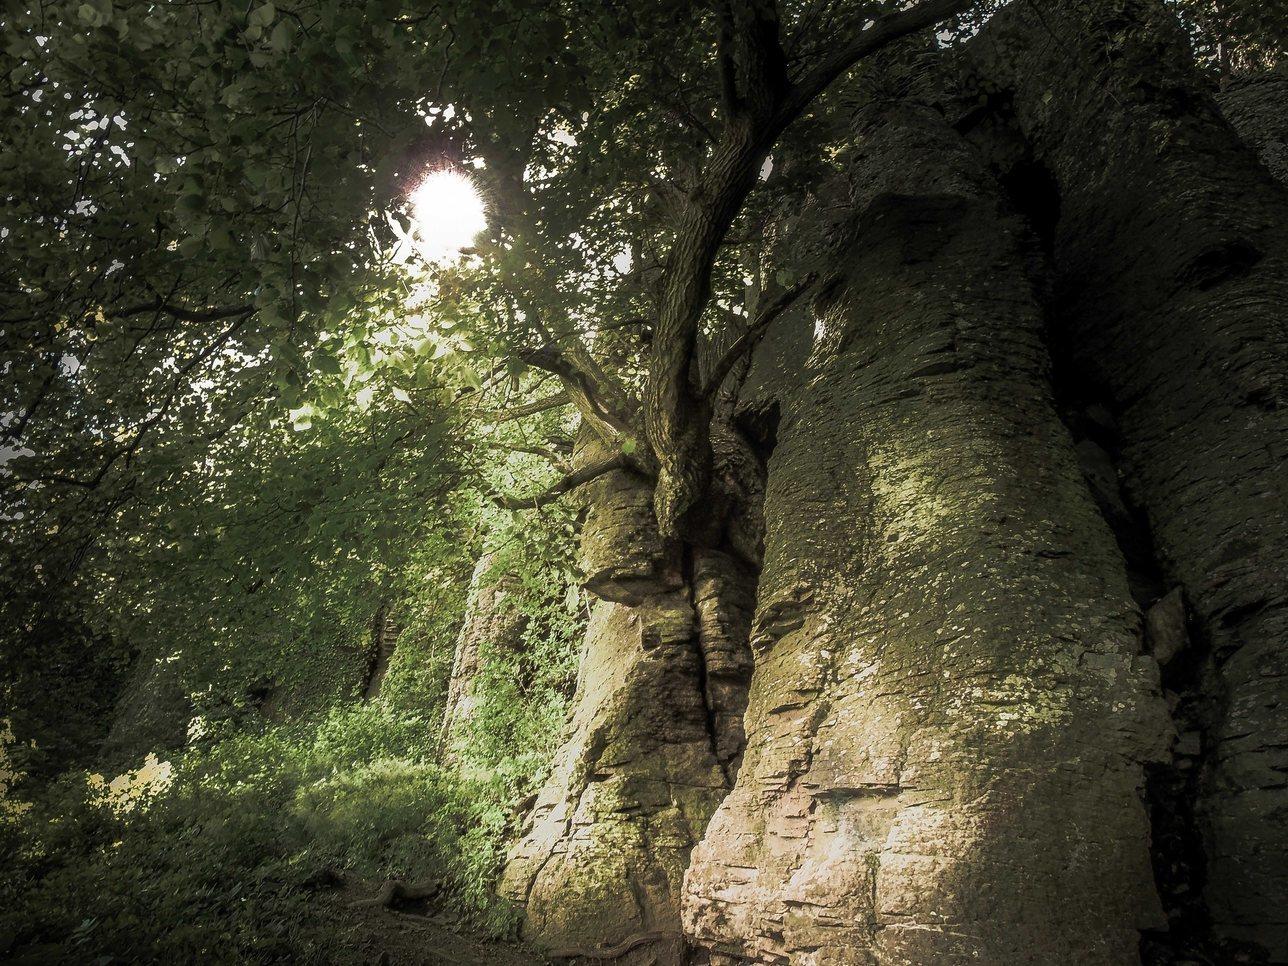 Tree Between Basalt Columns Fa Bazalt Oszlop